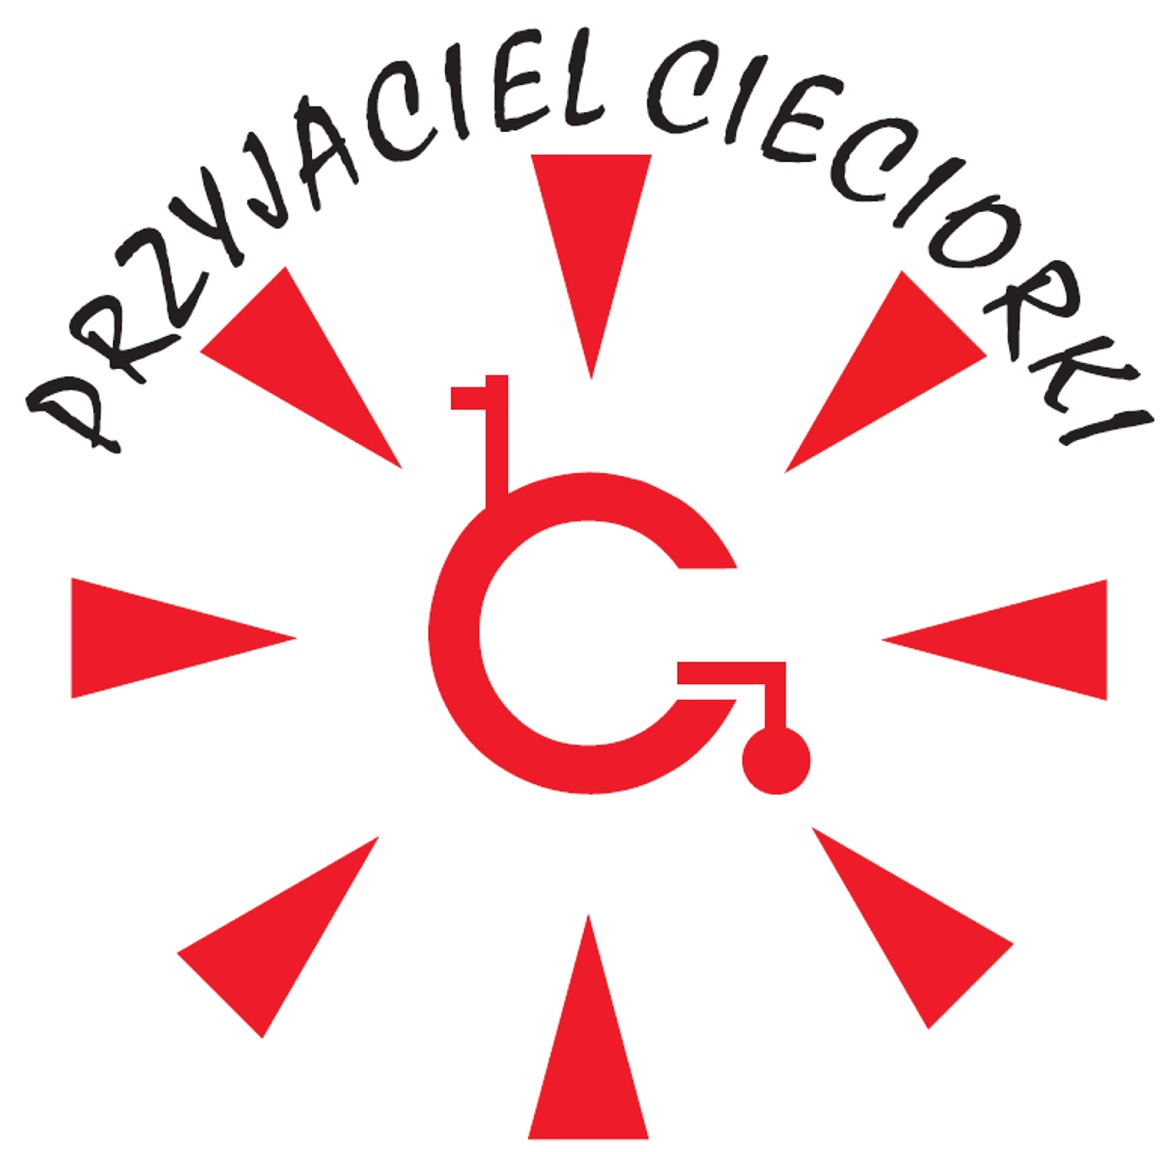 po-prostu-cieciorka-21-04-2016-r